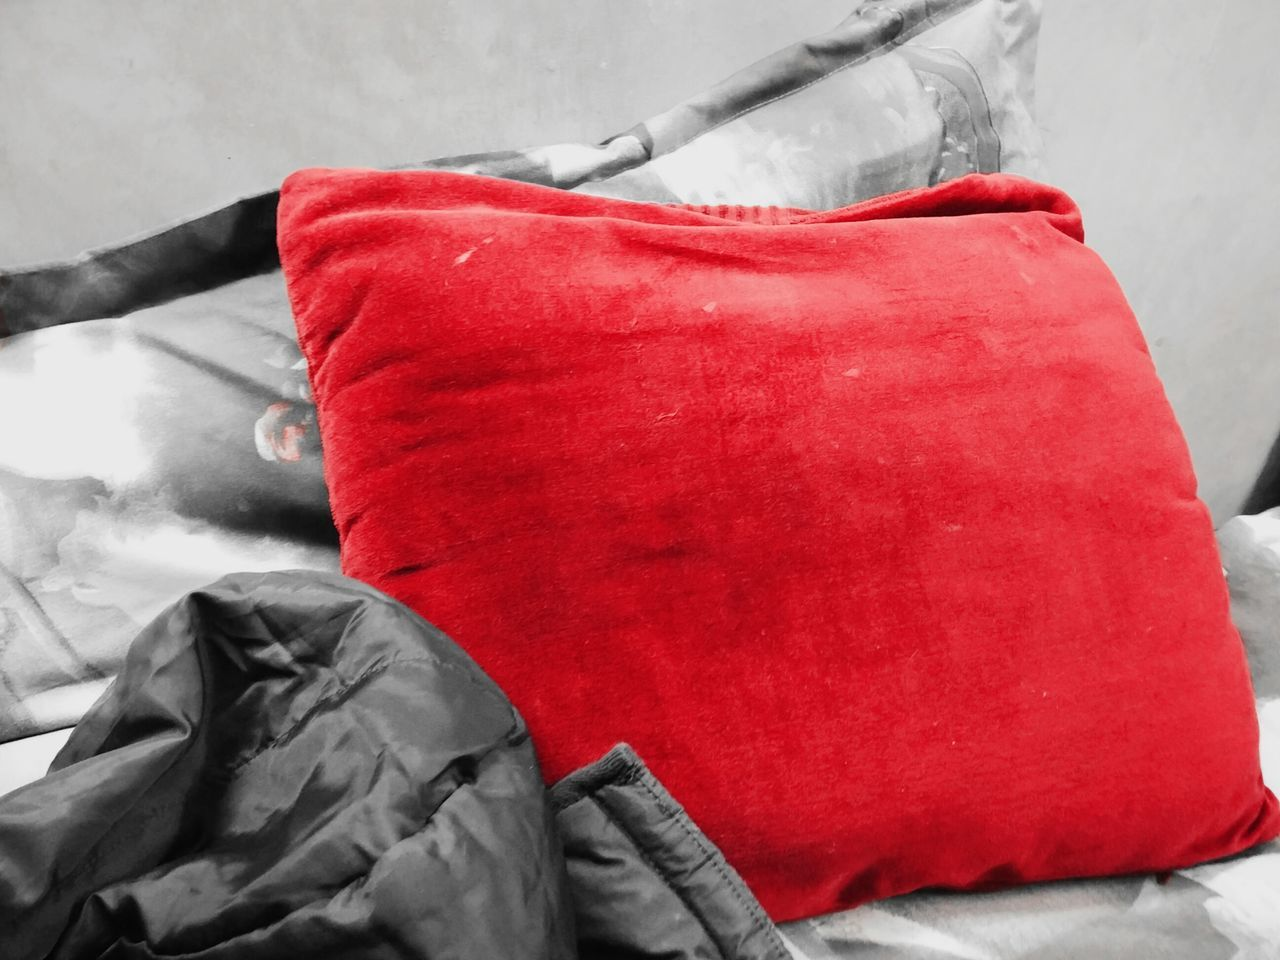 Photography Photographic Memory Random Randomshot Bedroom Bedroomlight Untidiness Jacket Pillow EyeEm Best Shots EyeEm Gallery EyeEm Best Edits Eyeemphotography Relaxing TheWeekOnEyeEM Learn & Shoot: Balancing Elements